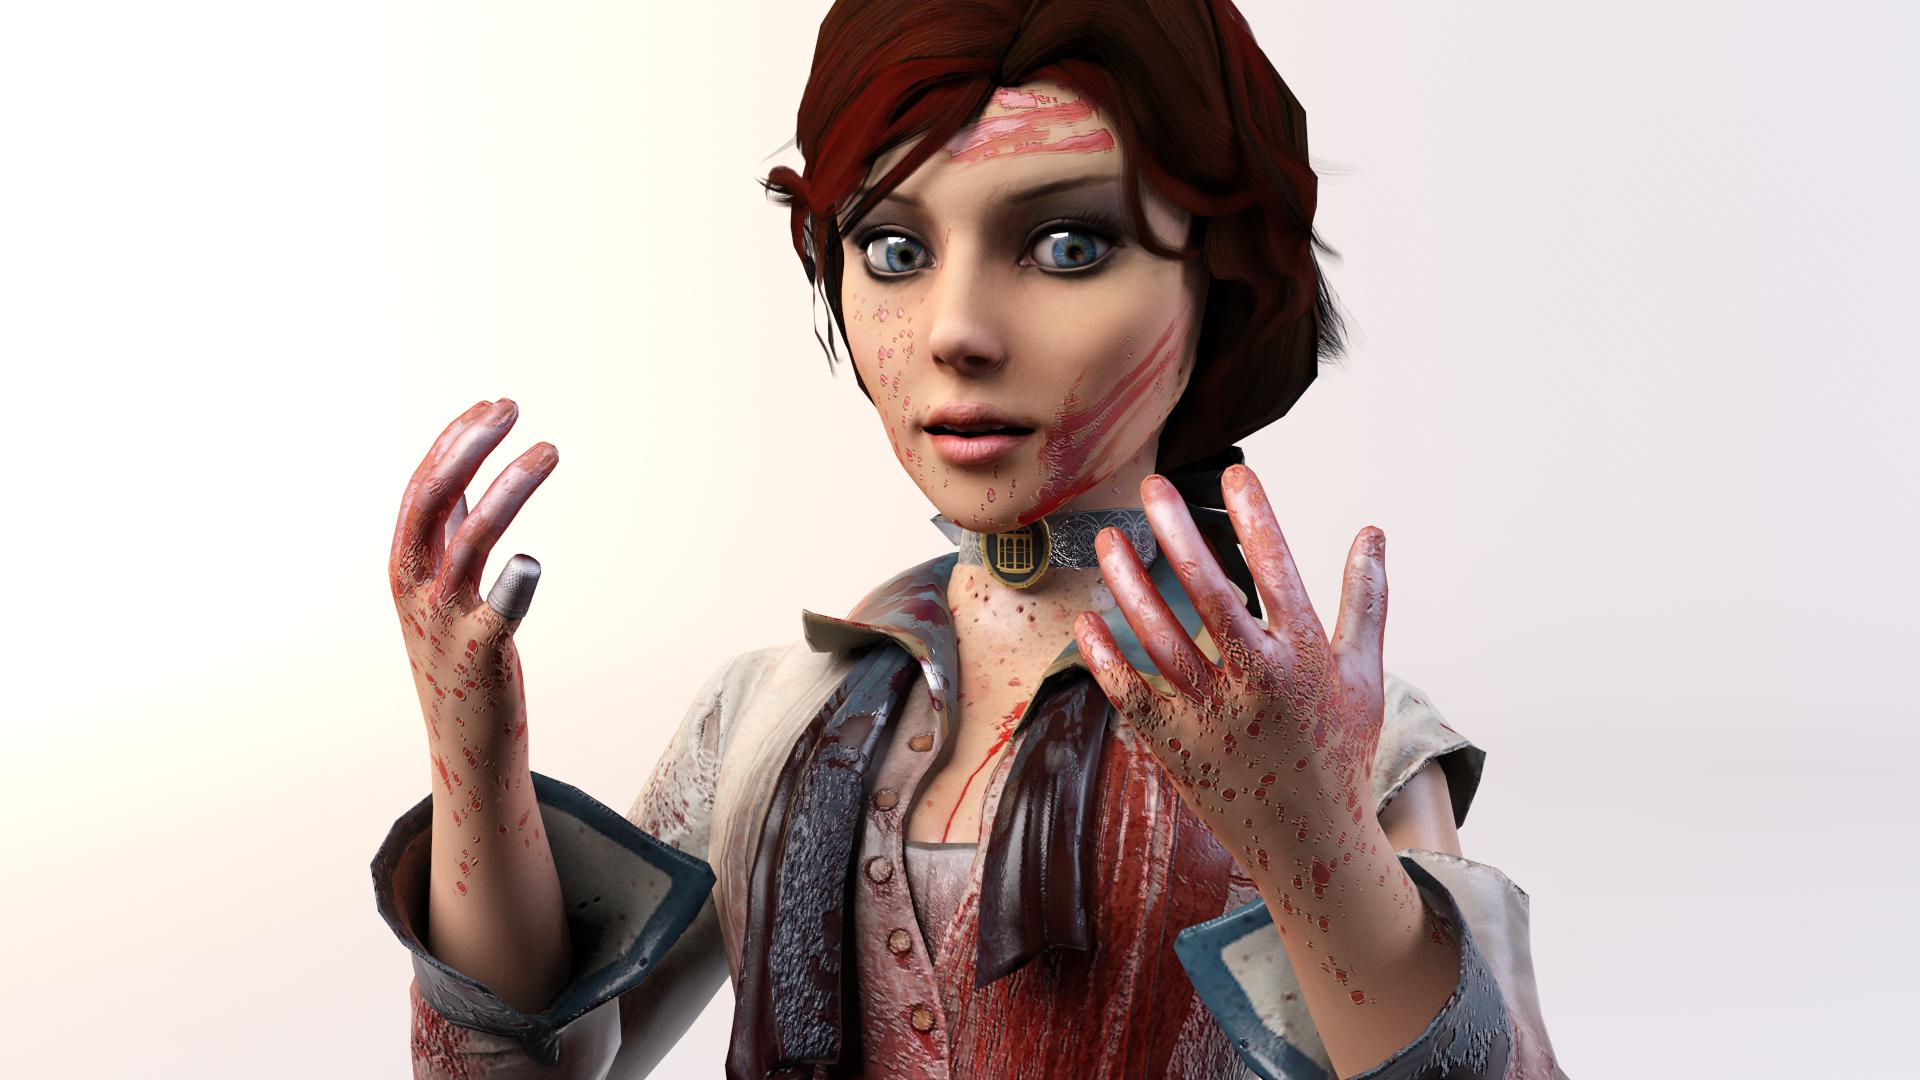 3DS Max - Elizabeth (BioShock Infinite) 3 by SilverMoonCrystal